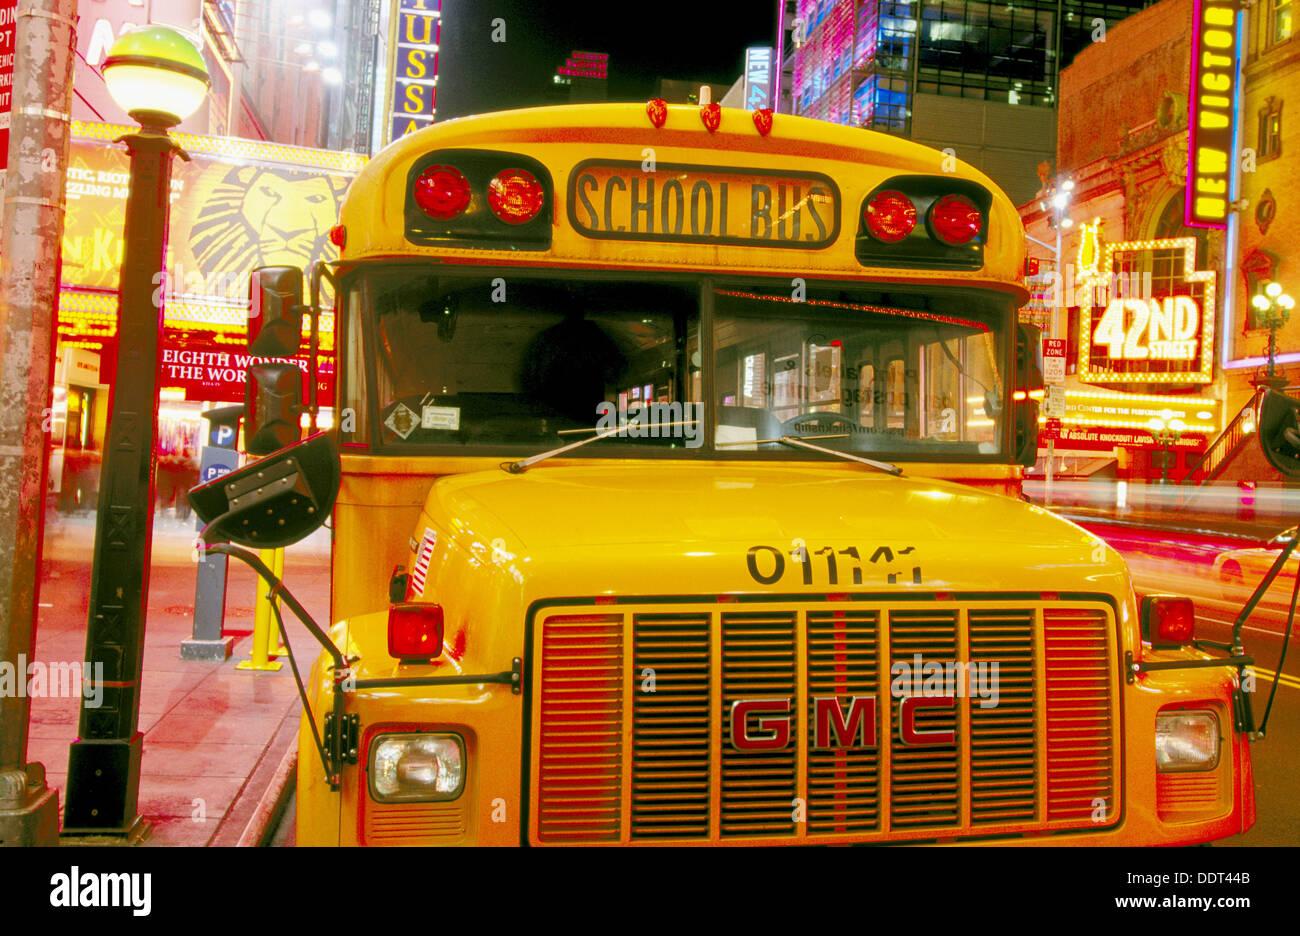 School bus on 42nd Street. New York City, USA - Stock Image